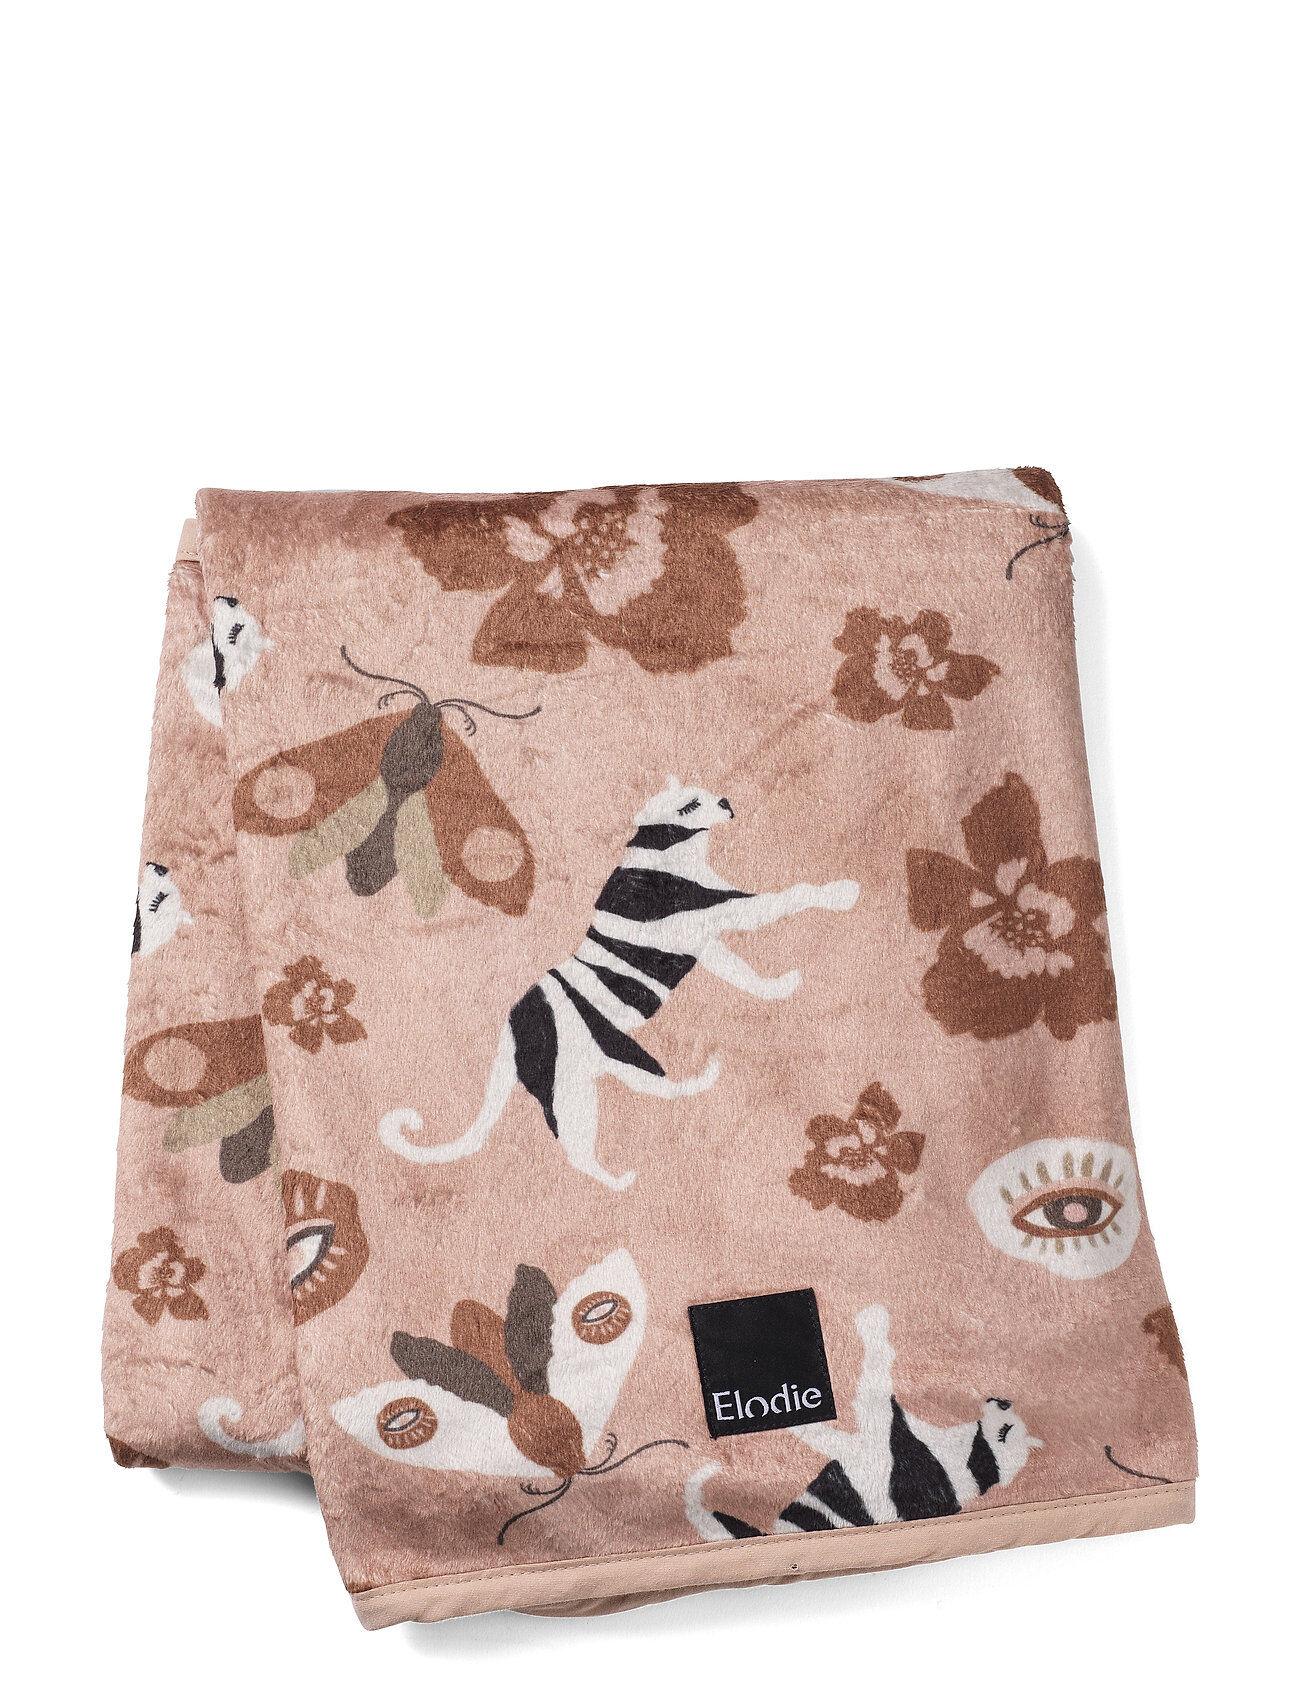 Elodie Details Pearl Velvet Blanket - Midnight Eye Home Sleep Time Blankets & Quilts Vaaleanpunainen Elodie Details